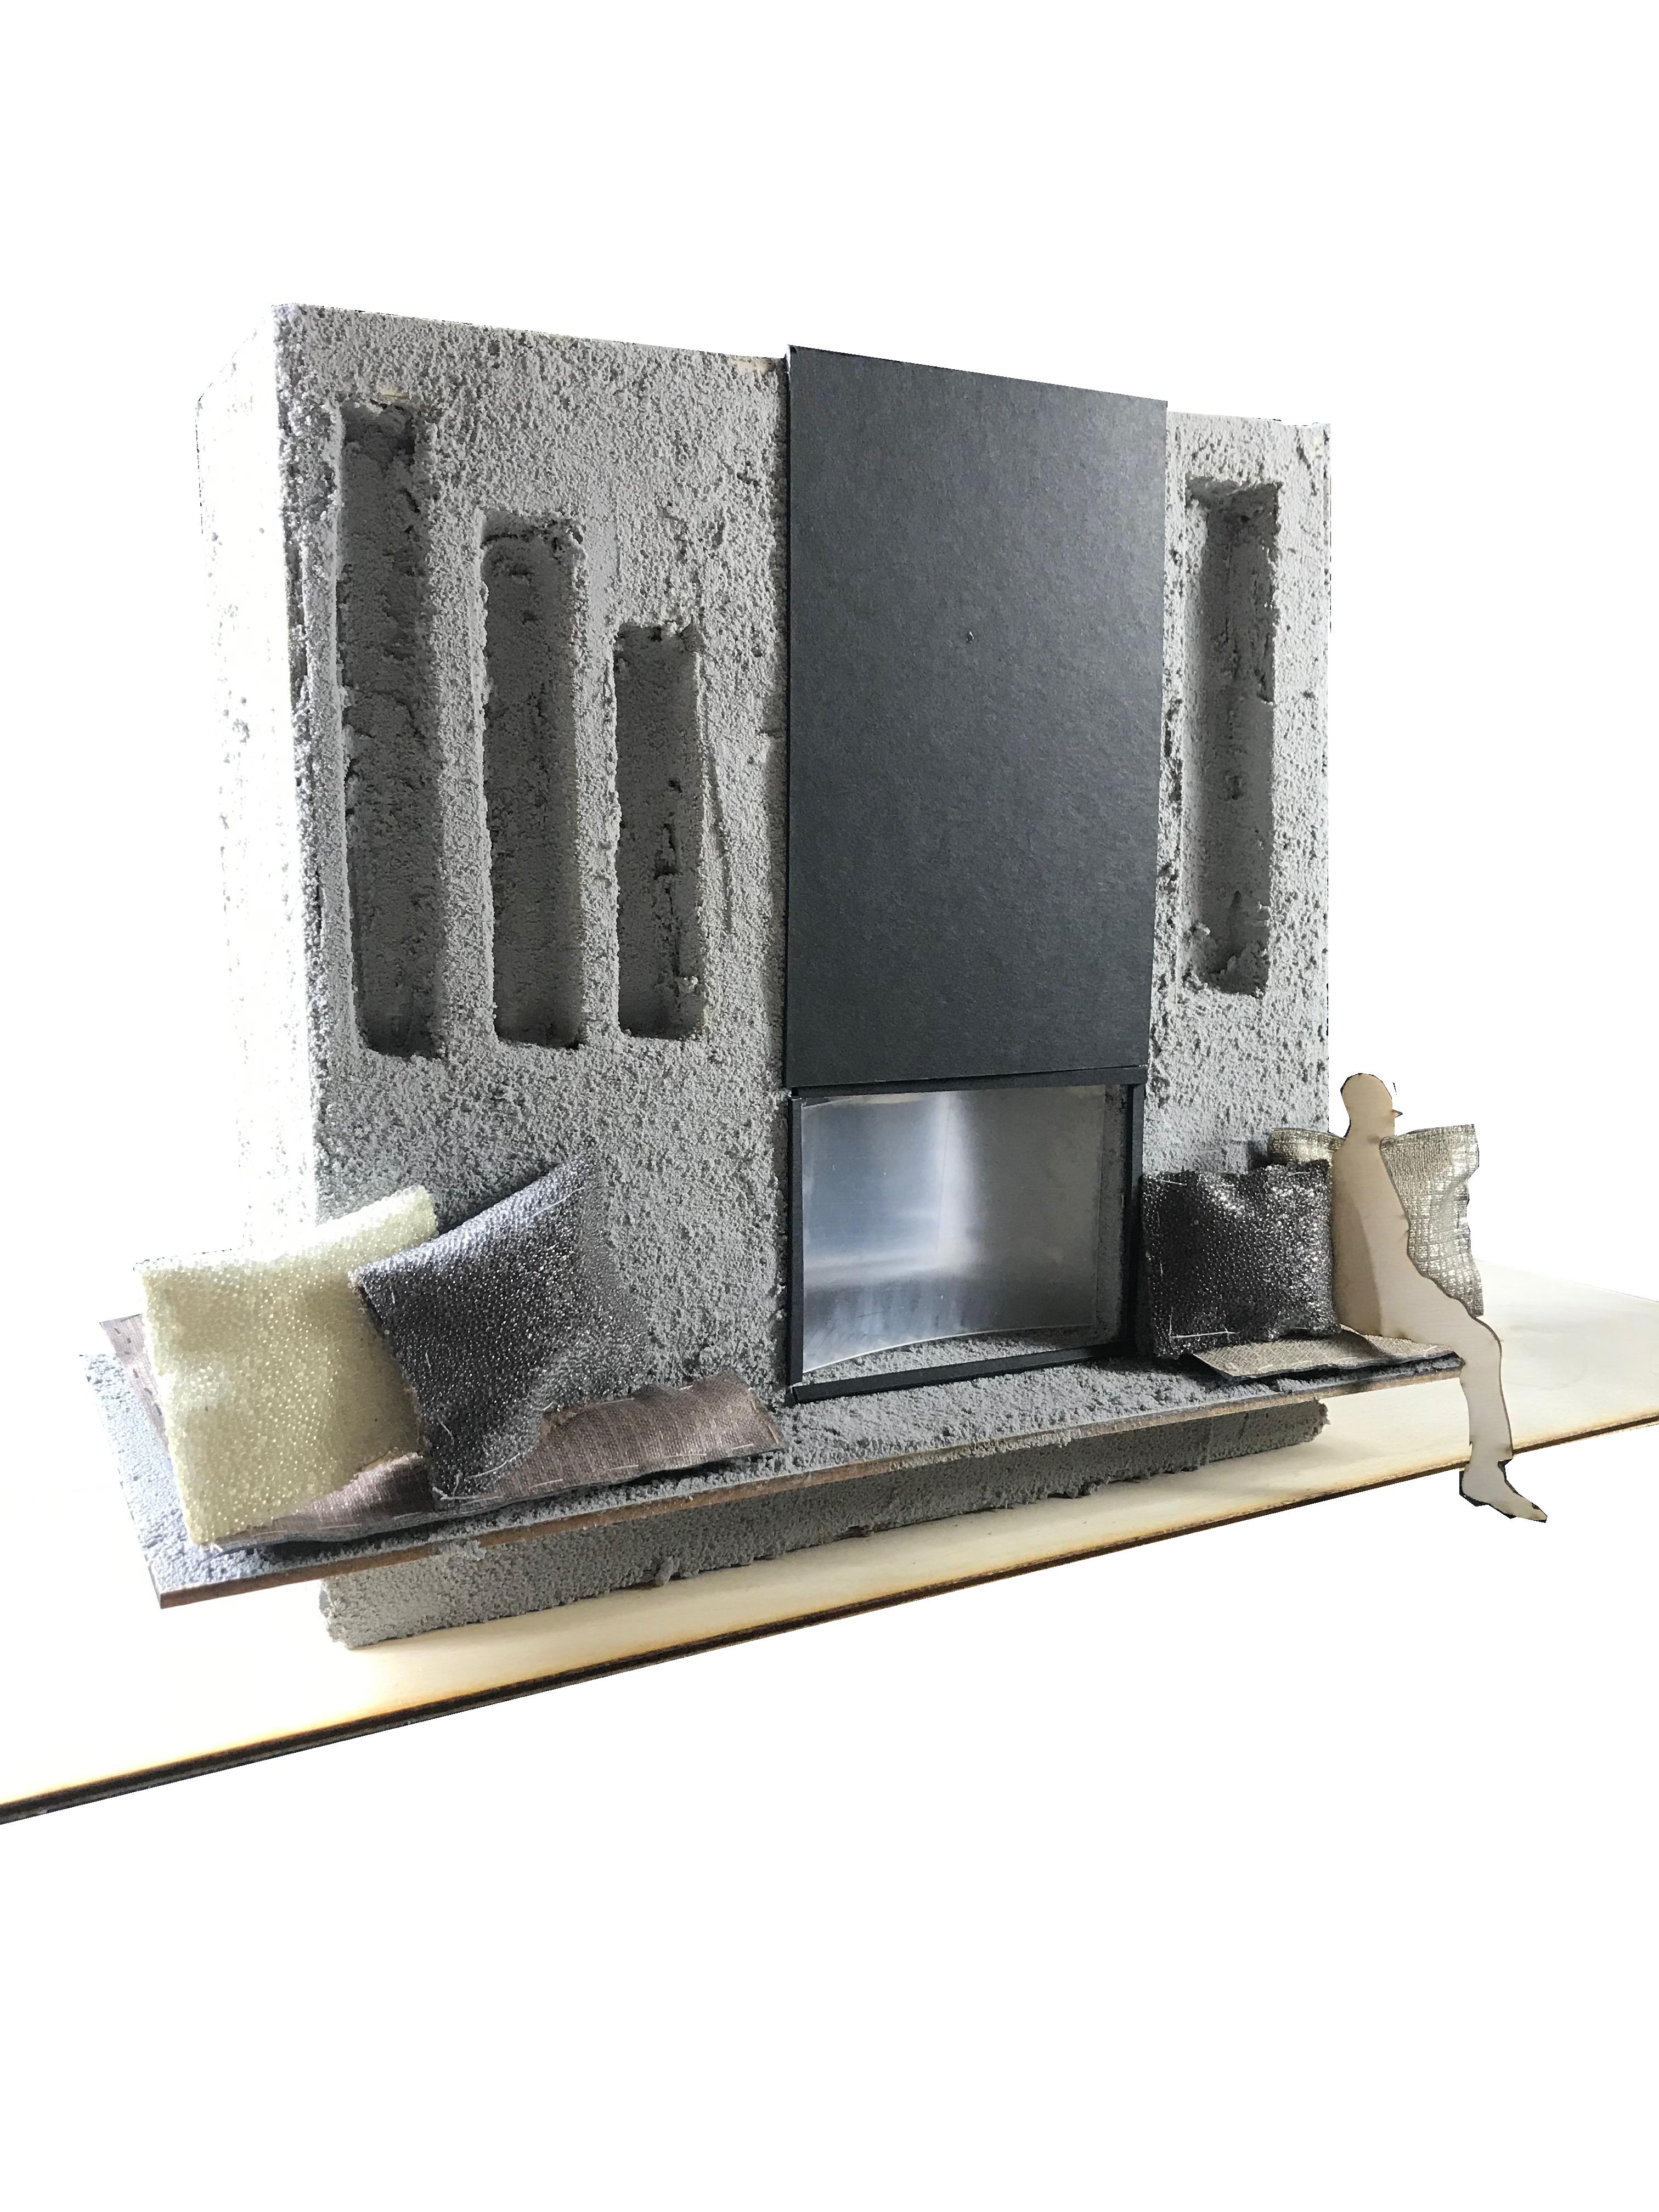 Hand-Made Model of Custom Fireplace